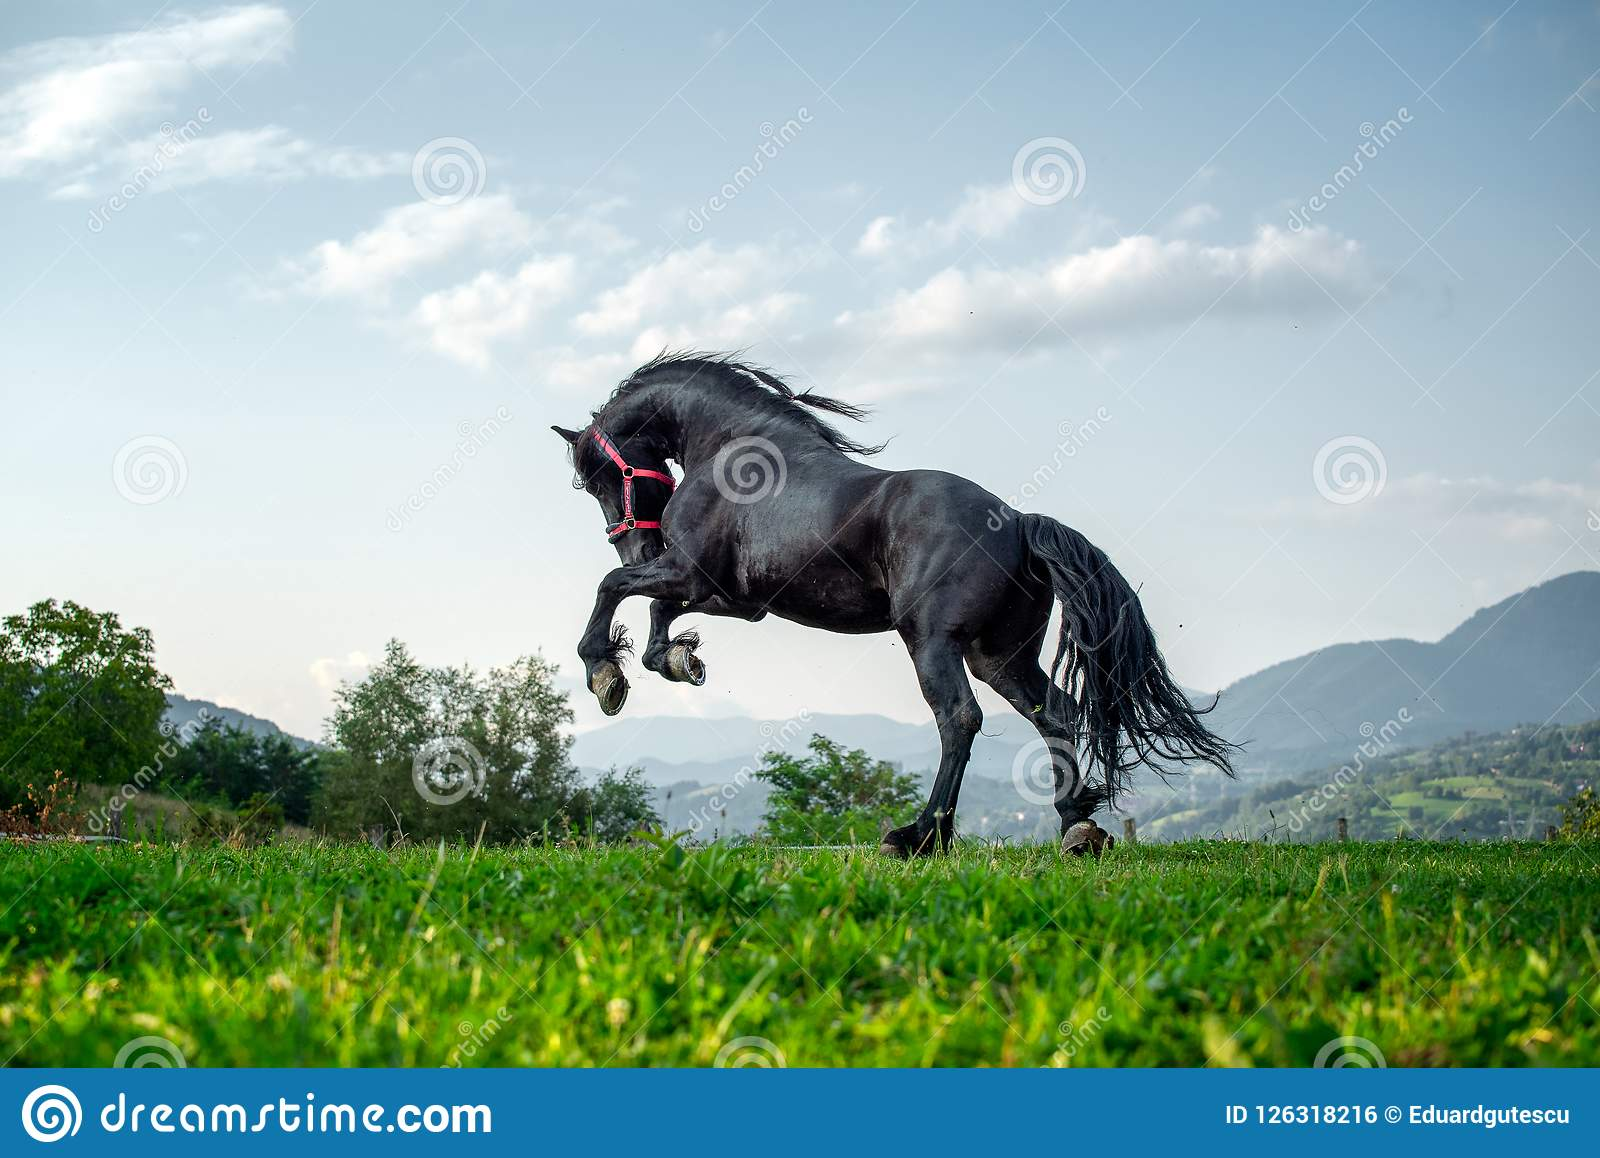 Black Friesian Horse Running At The Mountain Farm In Romania Black Beautiful Horse Stock Photo Image Of Stallion Farm 126318216